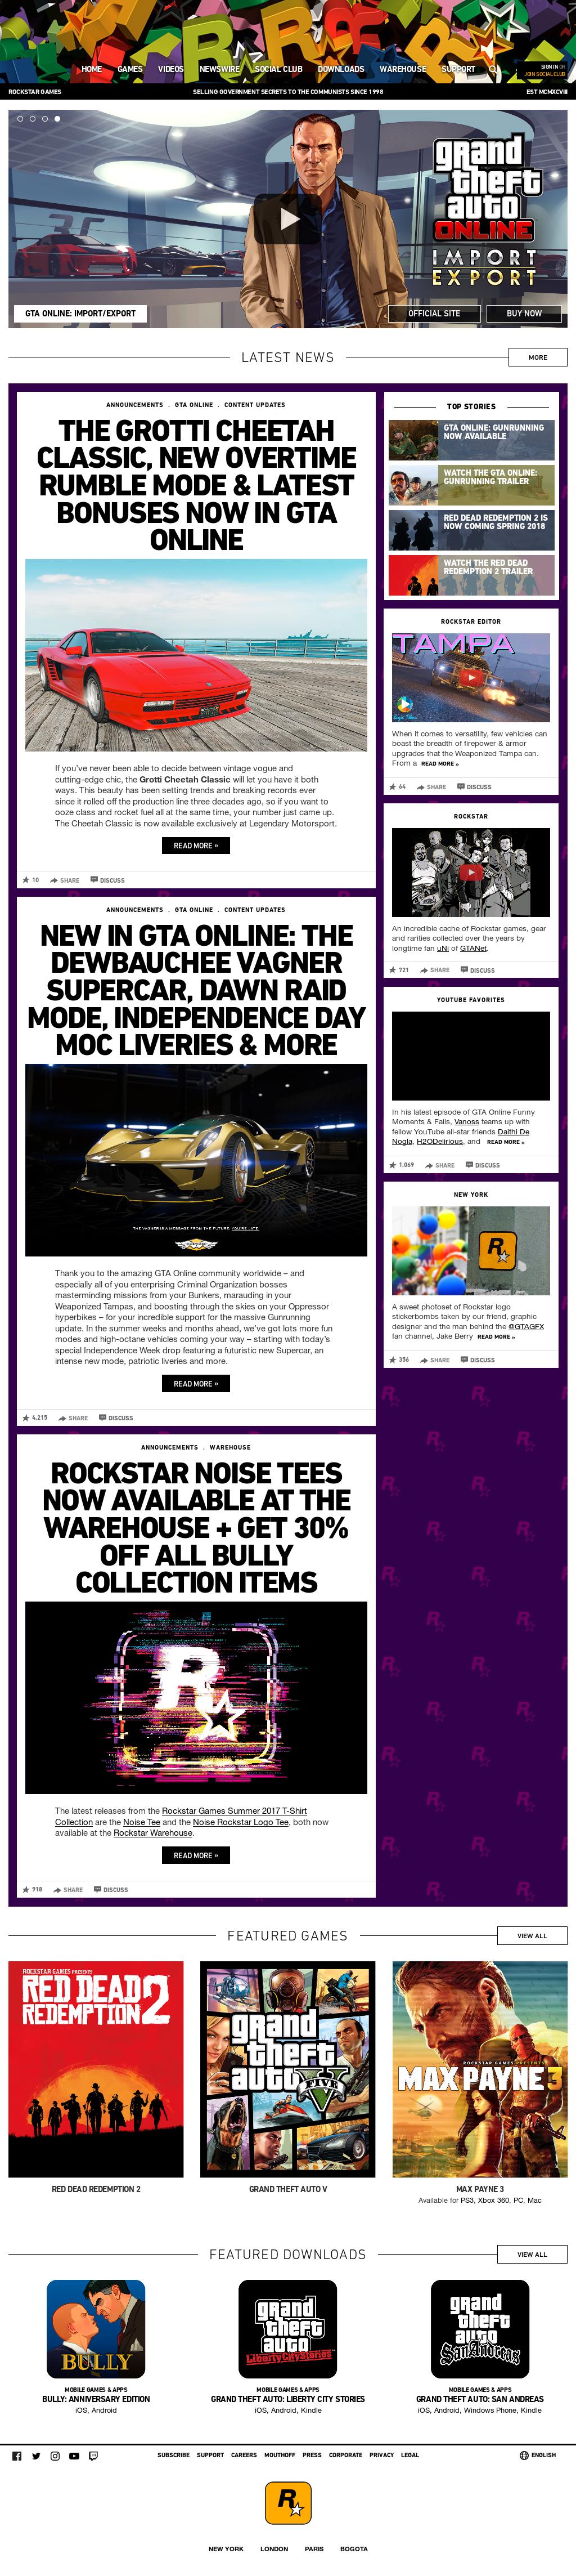 rockstar games warehouse phone number